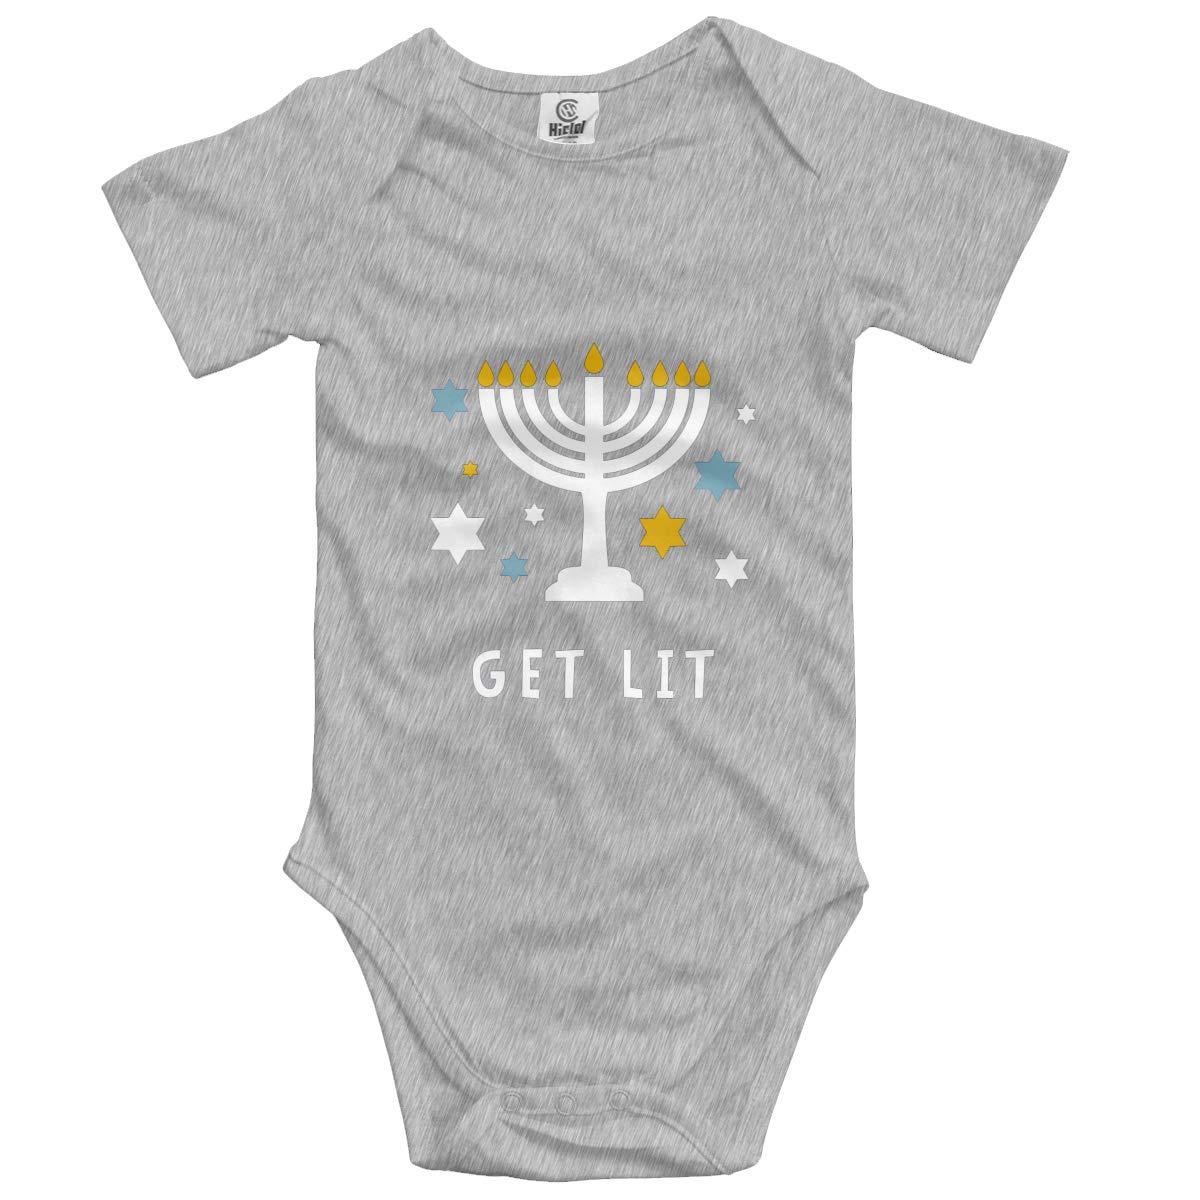 Nanagang Get Lit Babies Short Sleeves Baby Onesies Breathable Gray